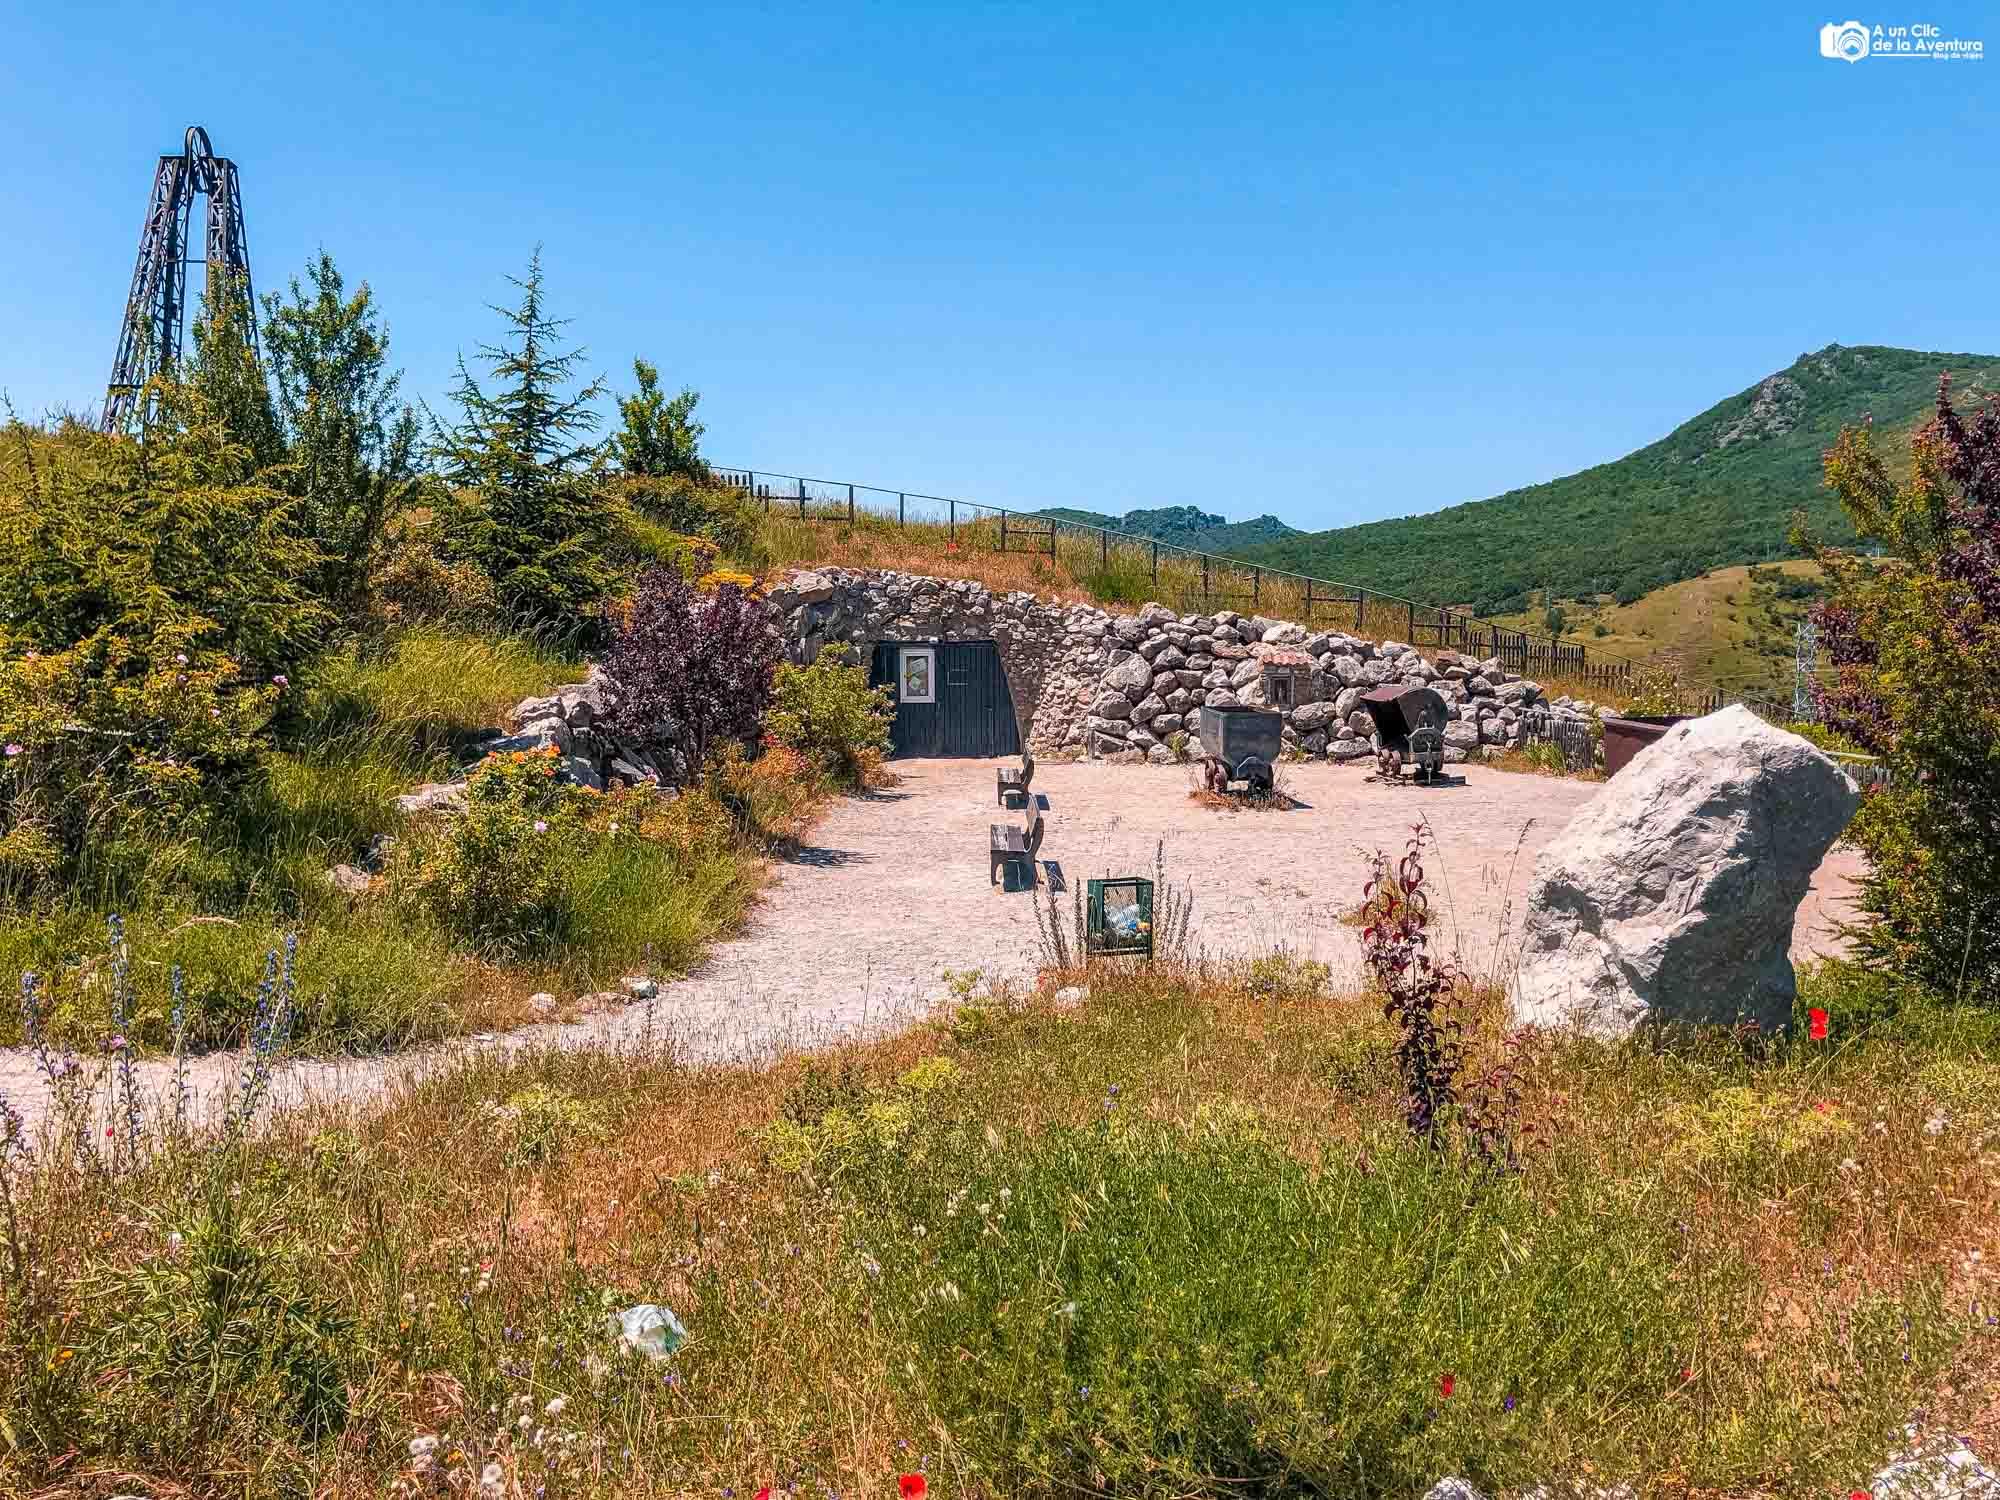 Exterior de la mina visitable de Barruelo de Santullán